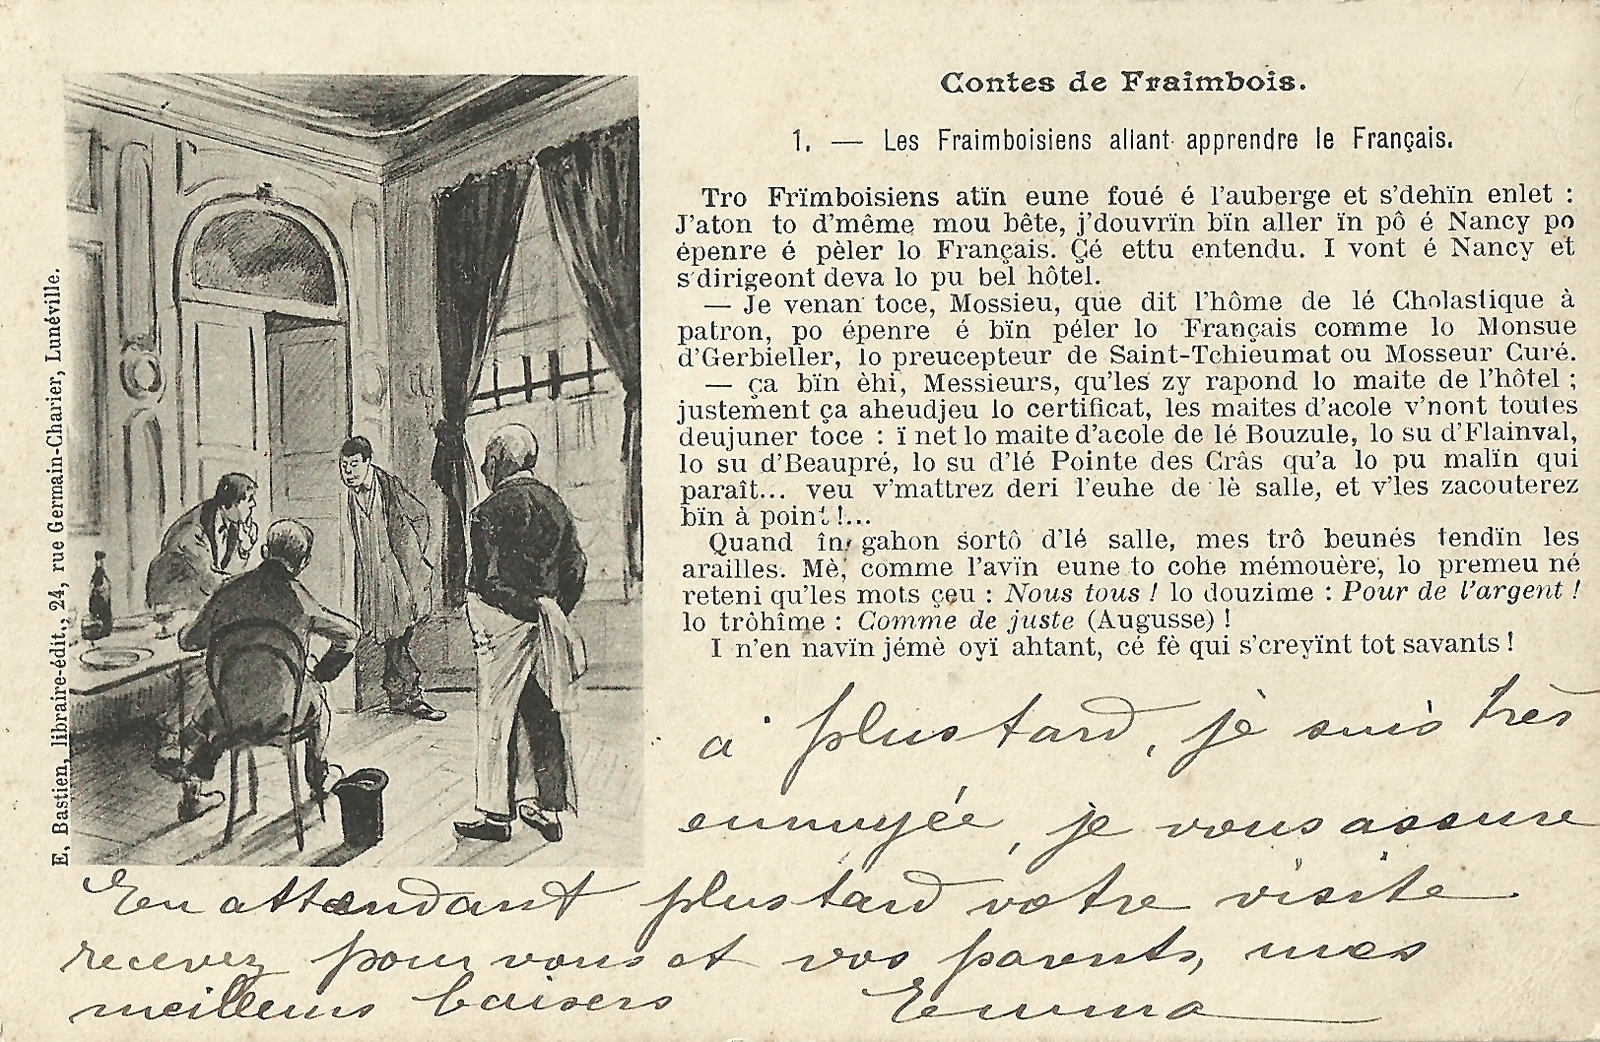 Contes de Fraimbois Wukali